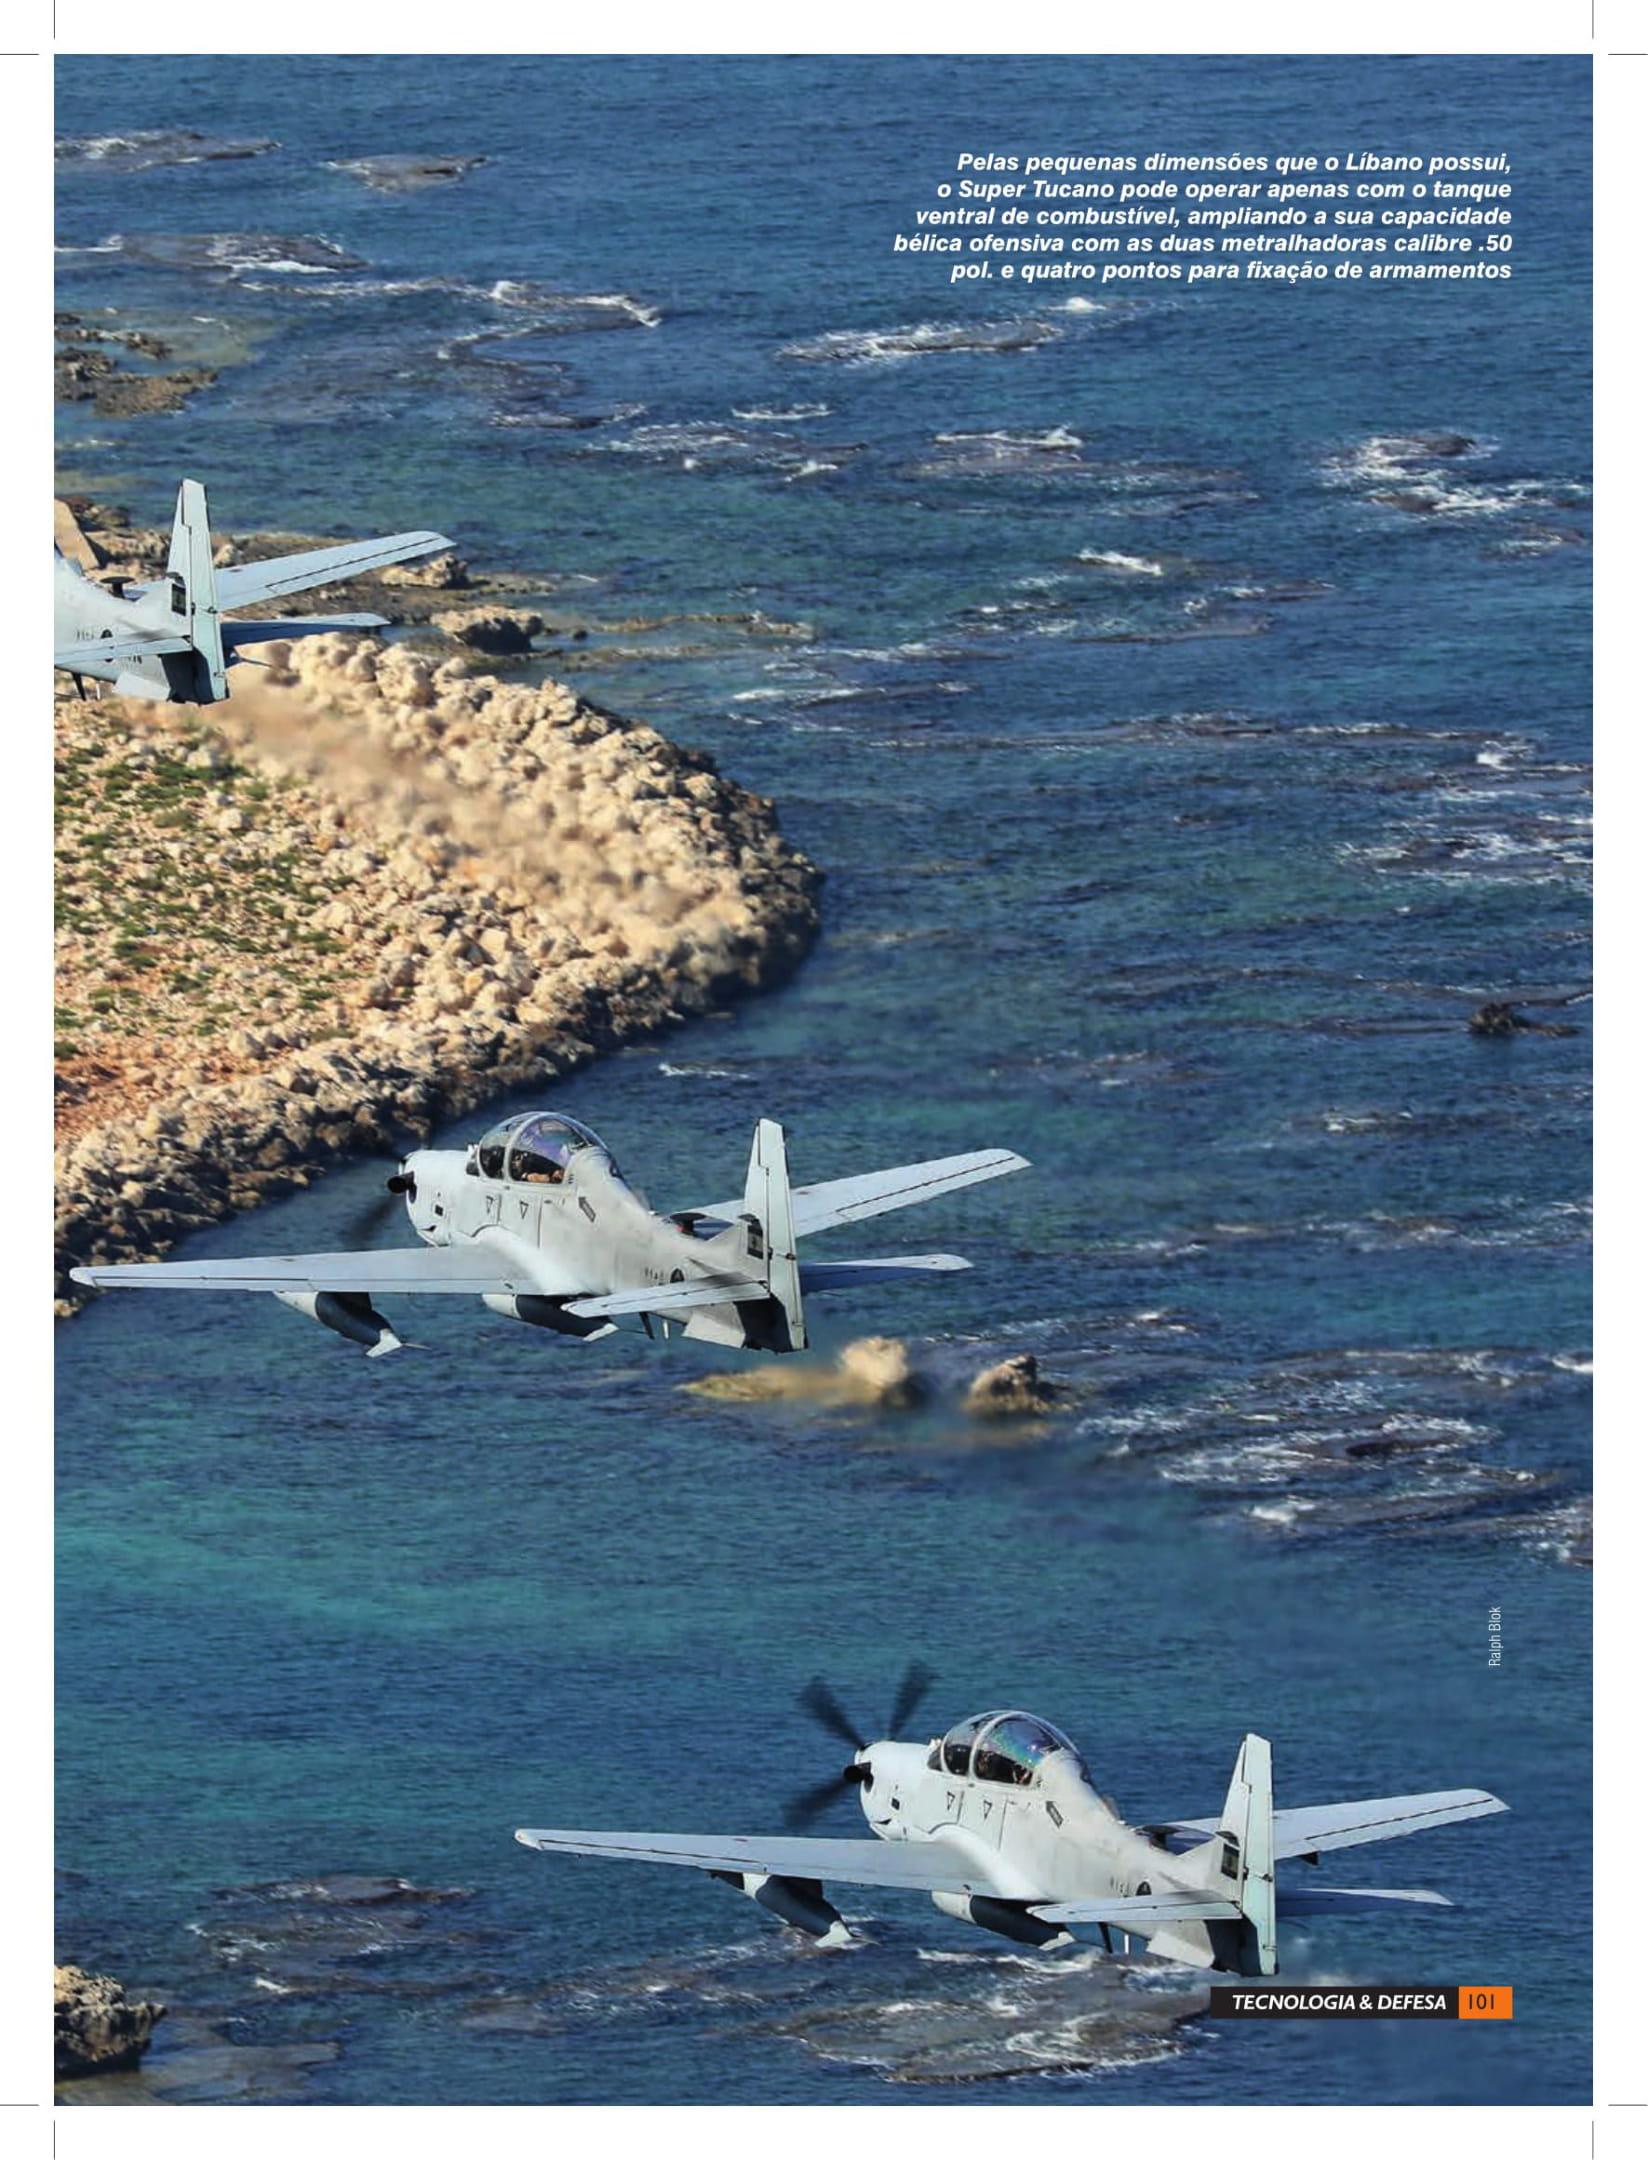 Tecnologia & Defesa (Brazil)_Lebanese Air Force-5